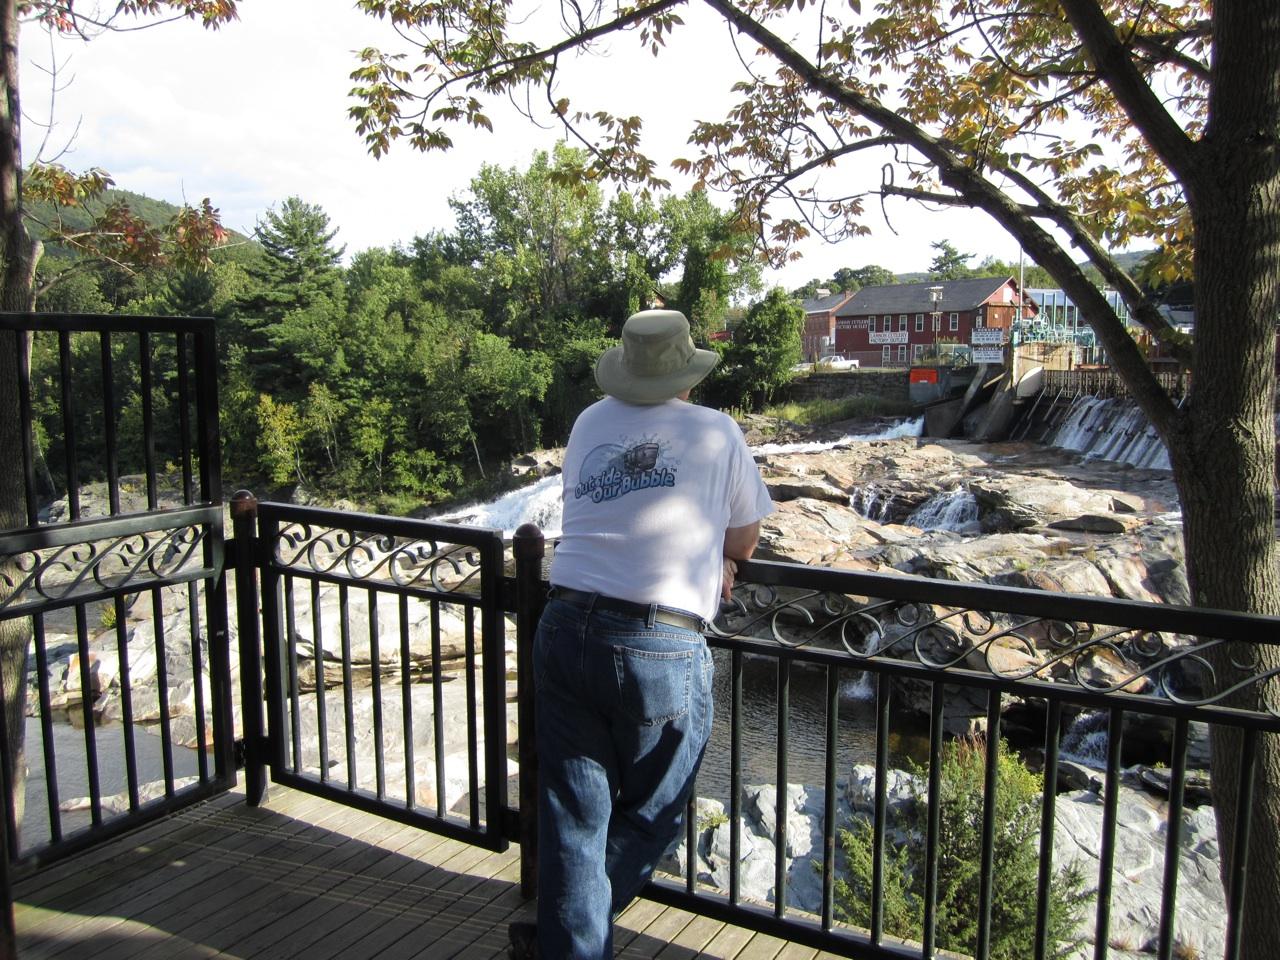 David Enjoying The Peacefulness Of Shelburne Falls, Massachusetts